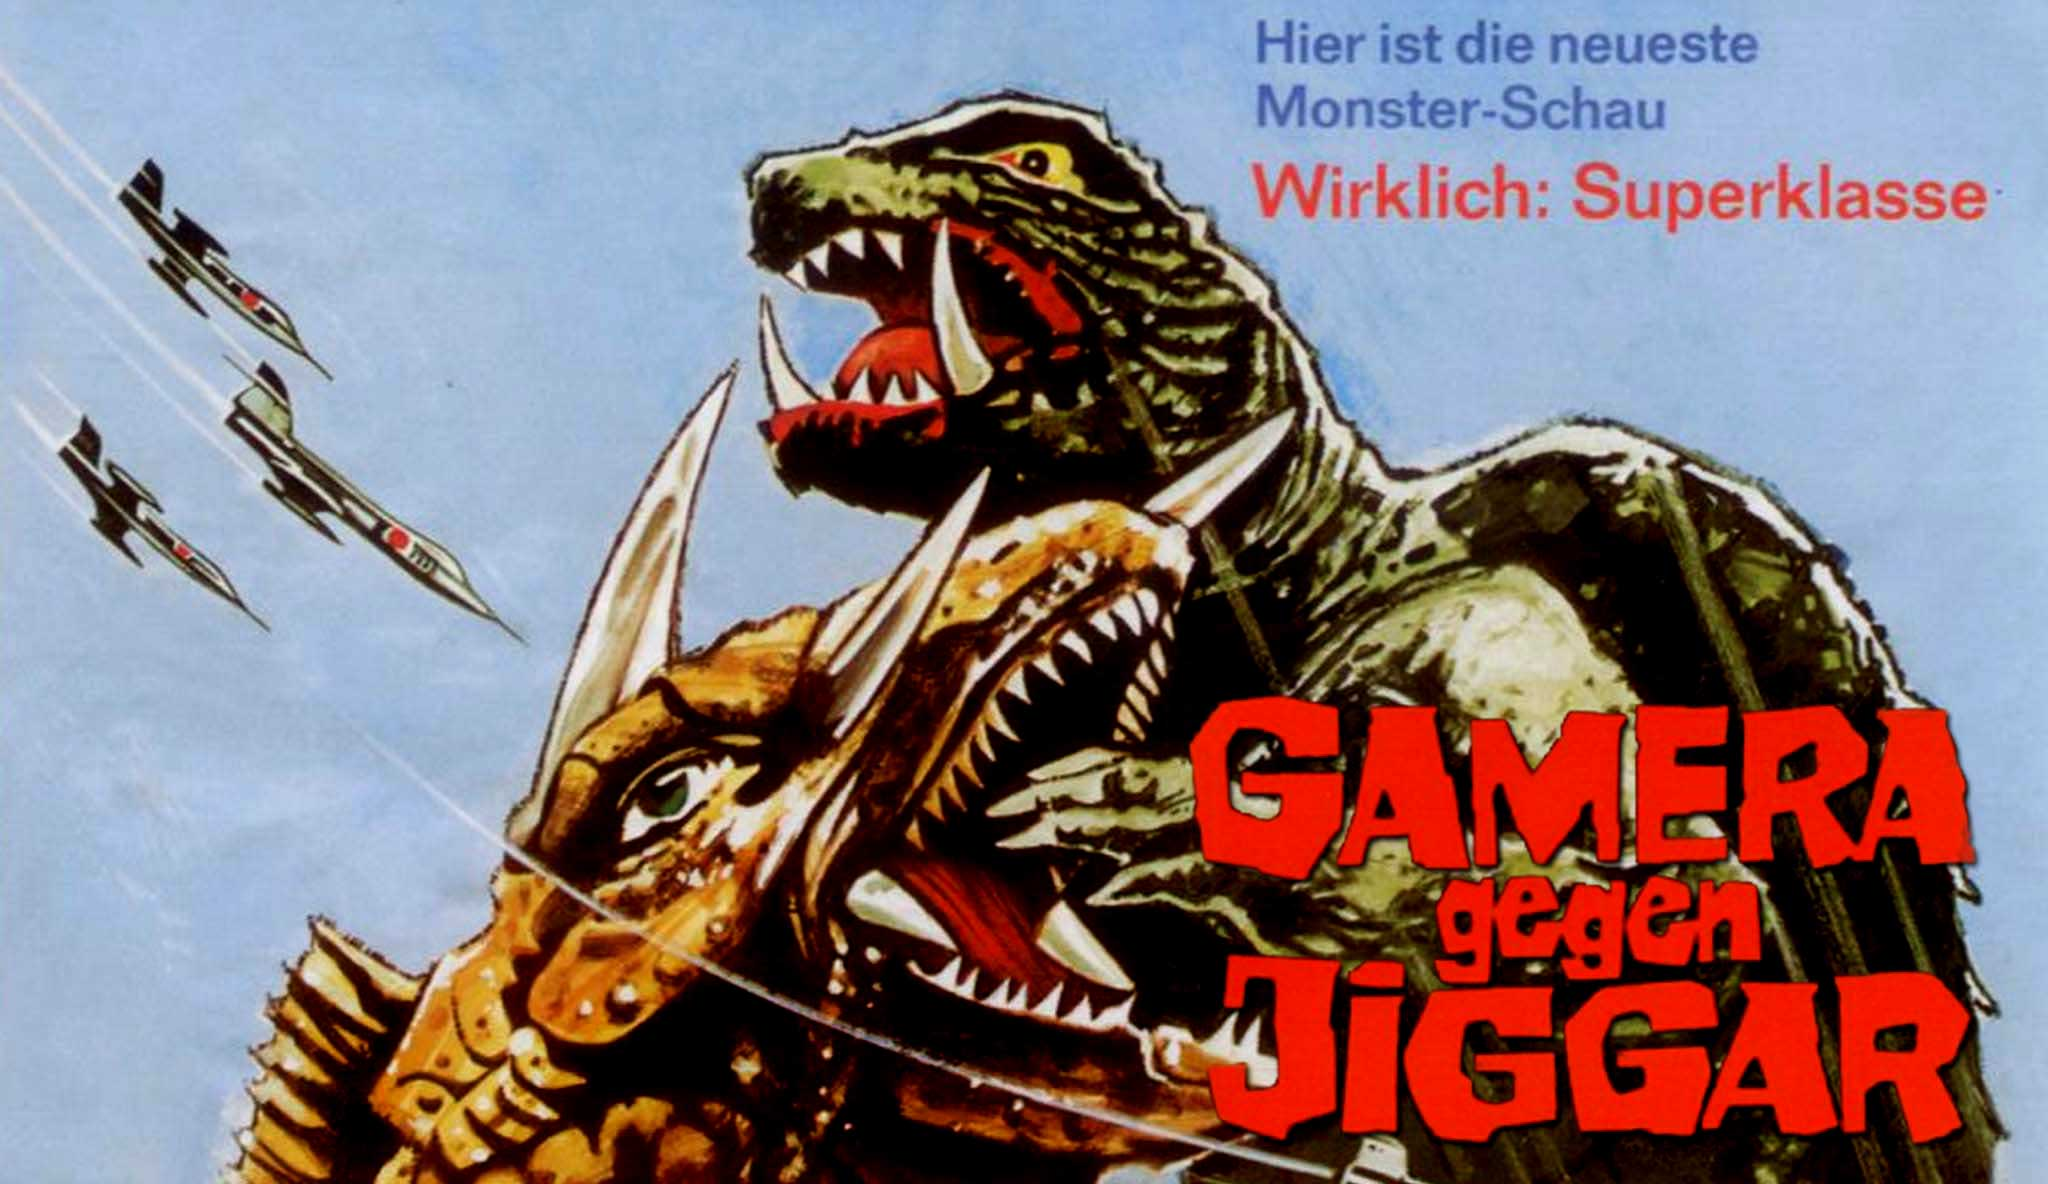 gamera-gegen-jiggar-frankensteins-damon-bedroht-die-welt\widescreen.jpg